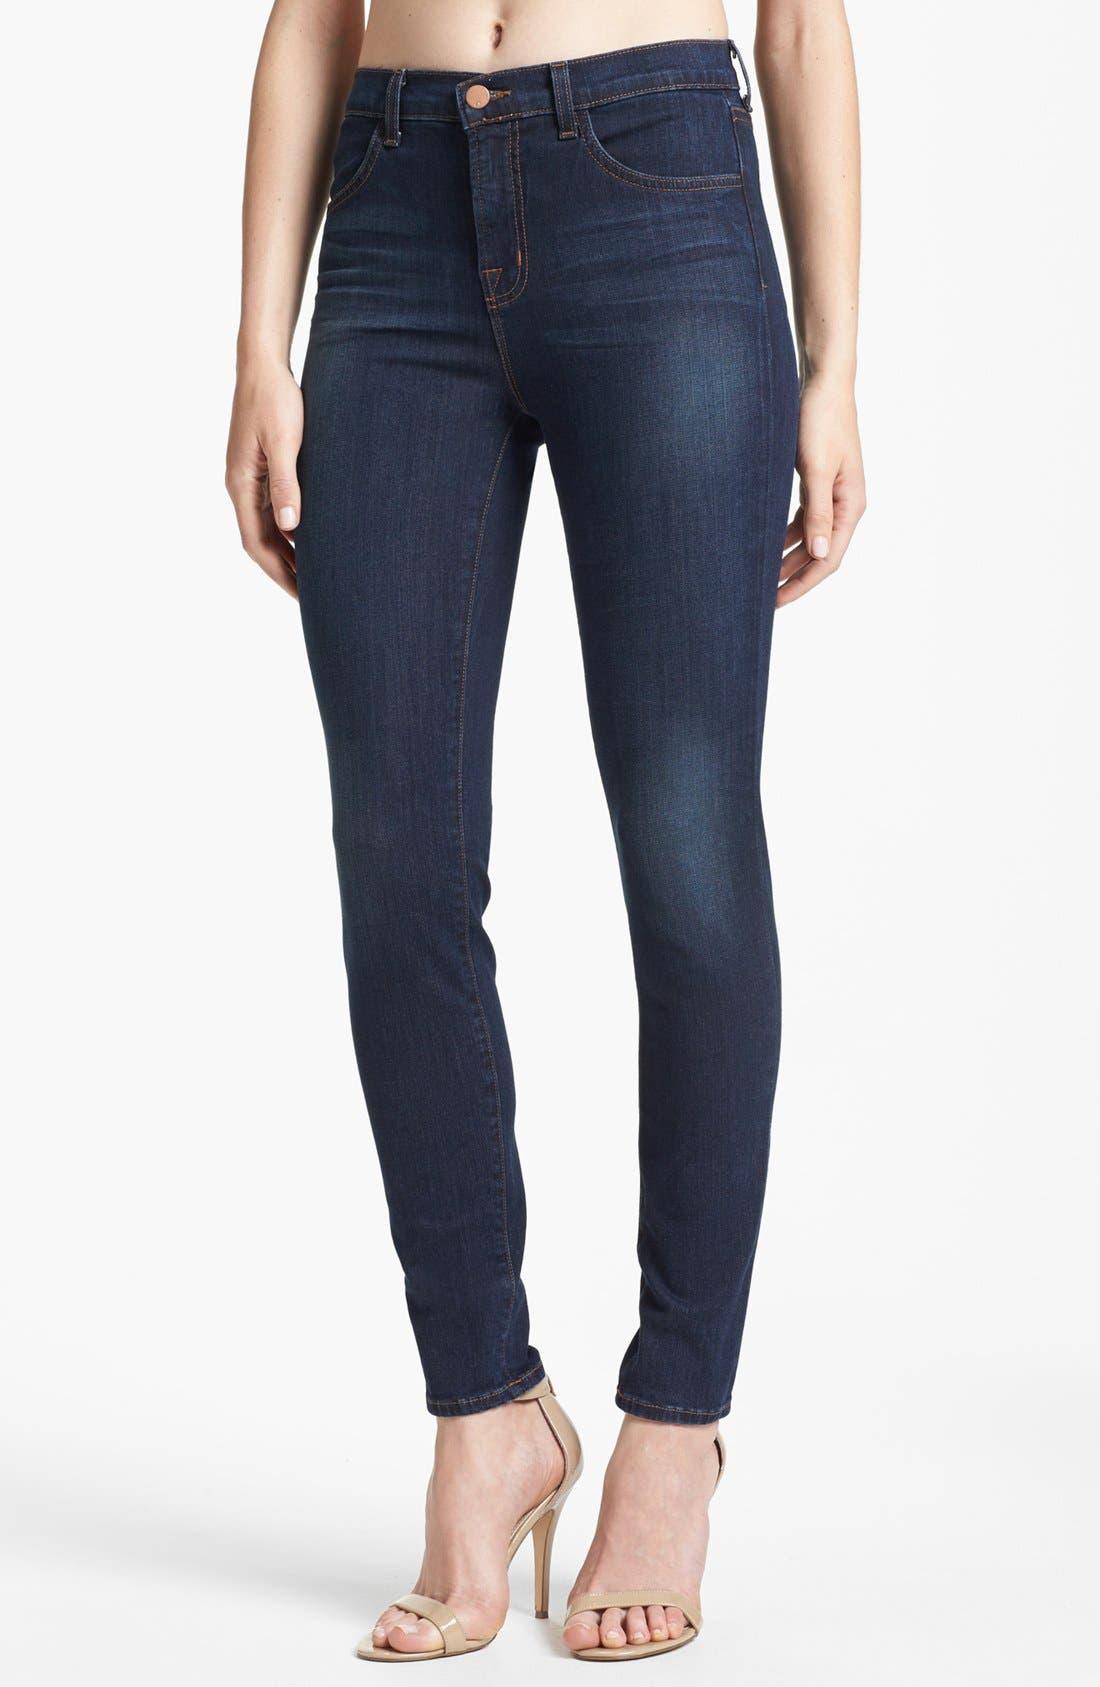 Alternate Image 1 Selected - J Brand '2311 Maria' High Rise Jeans (Veruca)